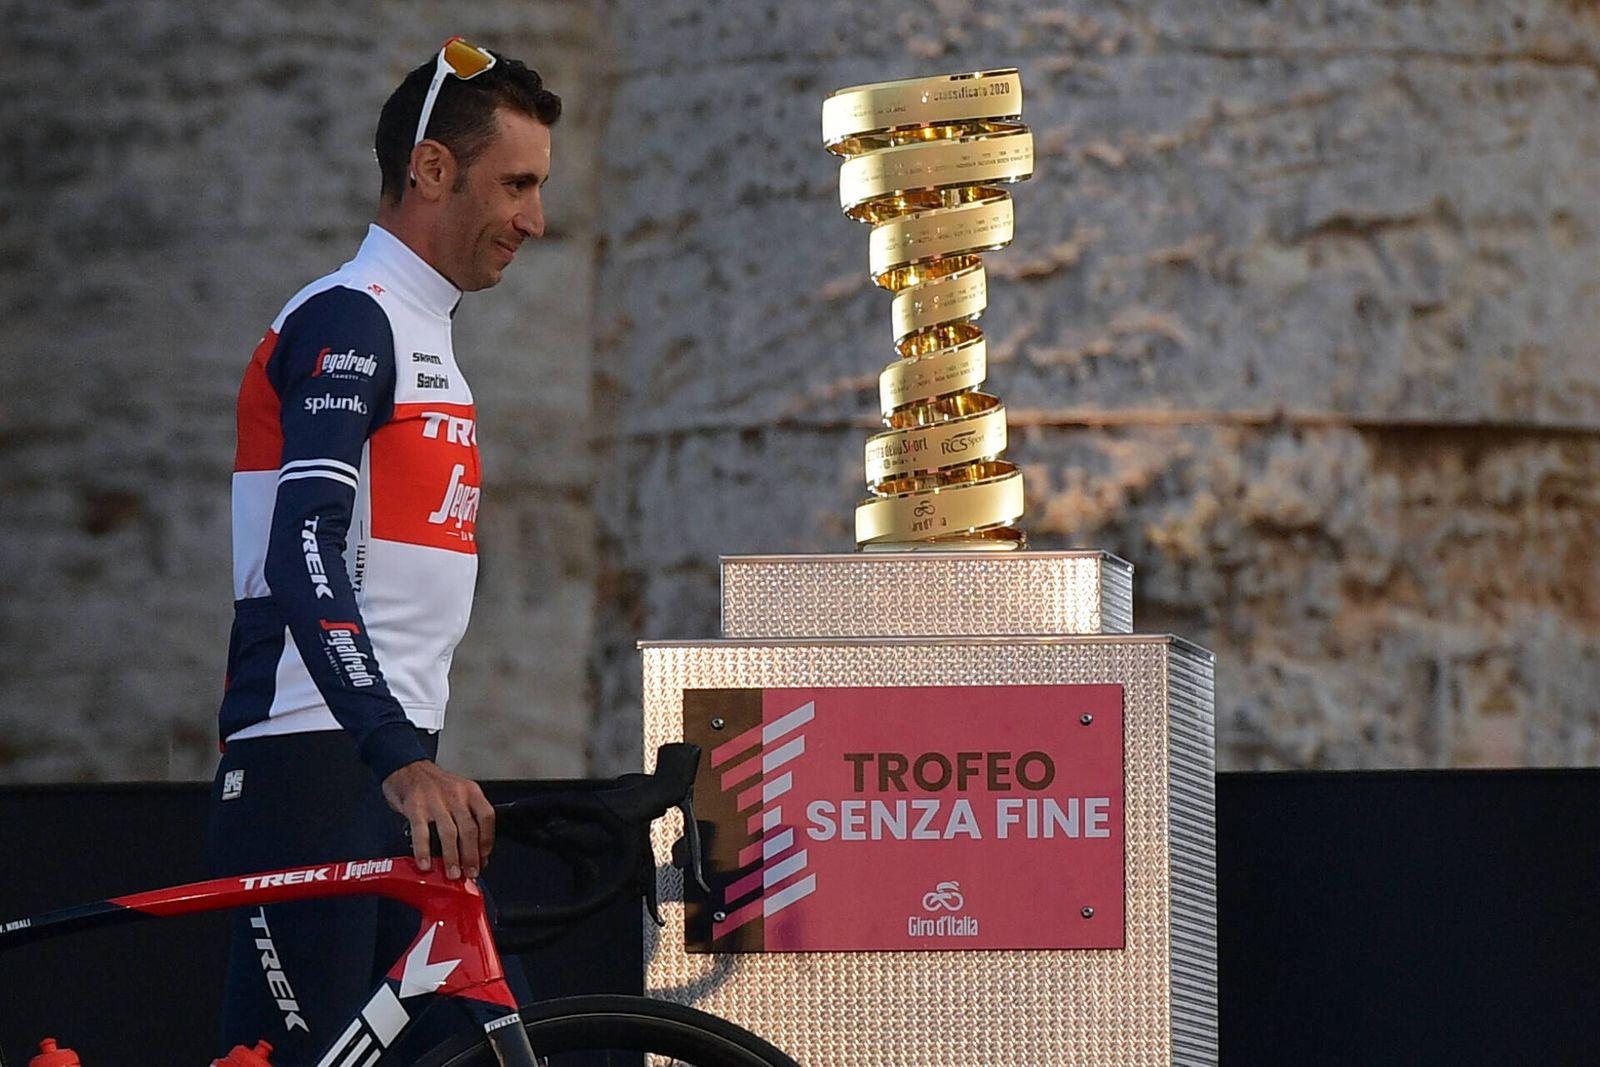 Photo Gian Mattia D Alberto/LaPresse October 01, 2020 Segesta, Palermo (Italy) Cycling Giro d Italia 2020 - 103th editi